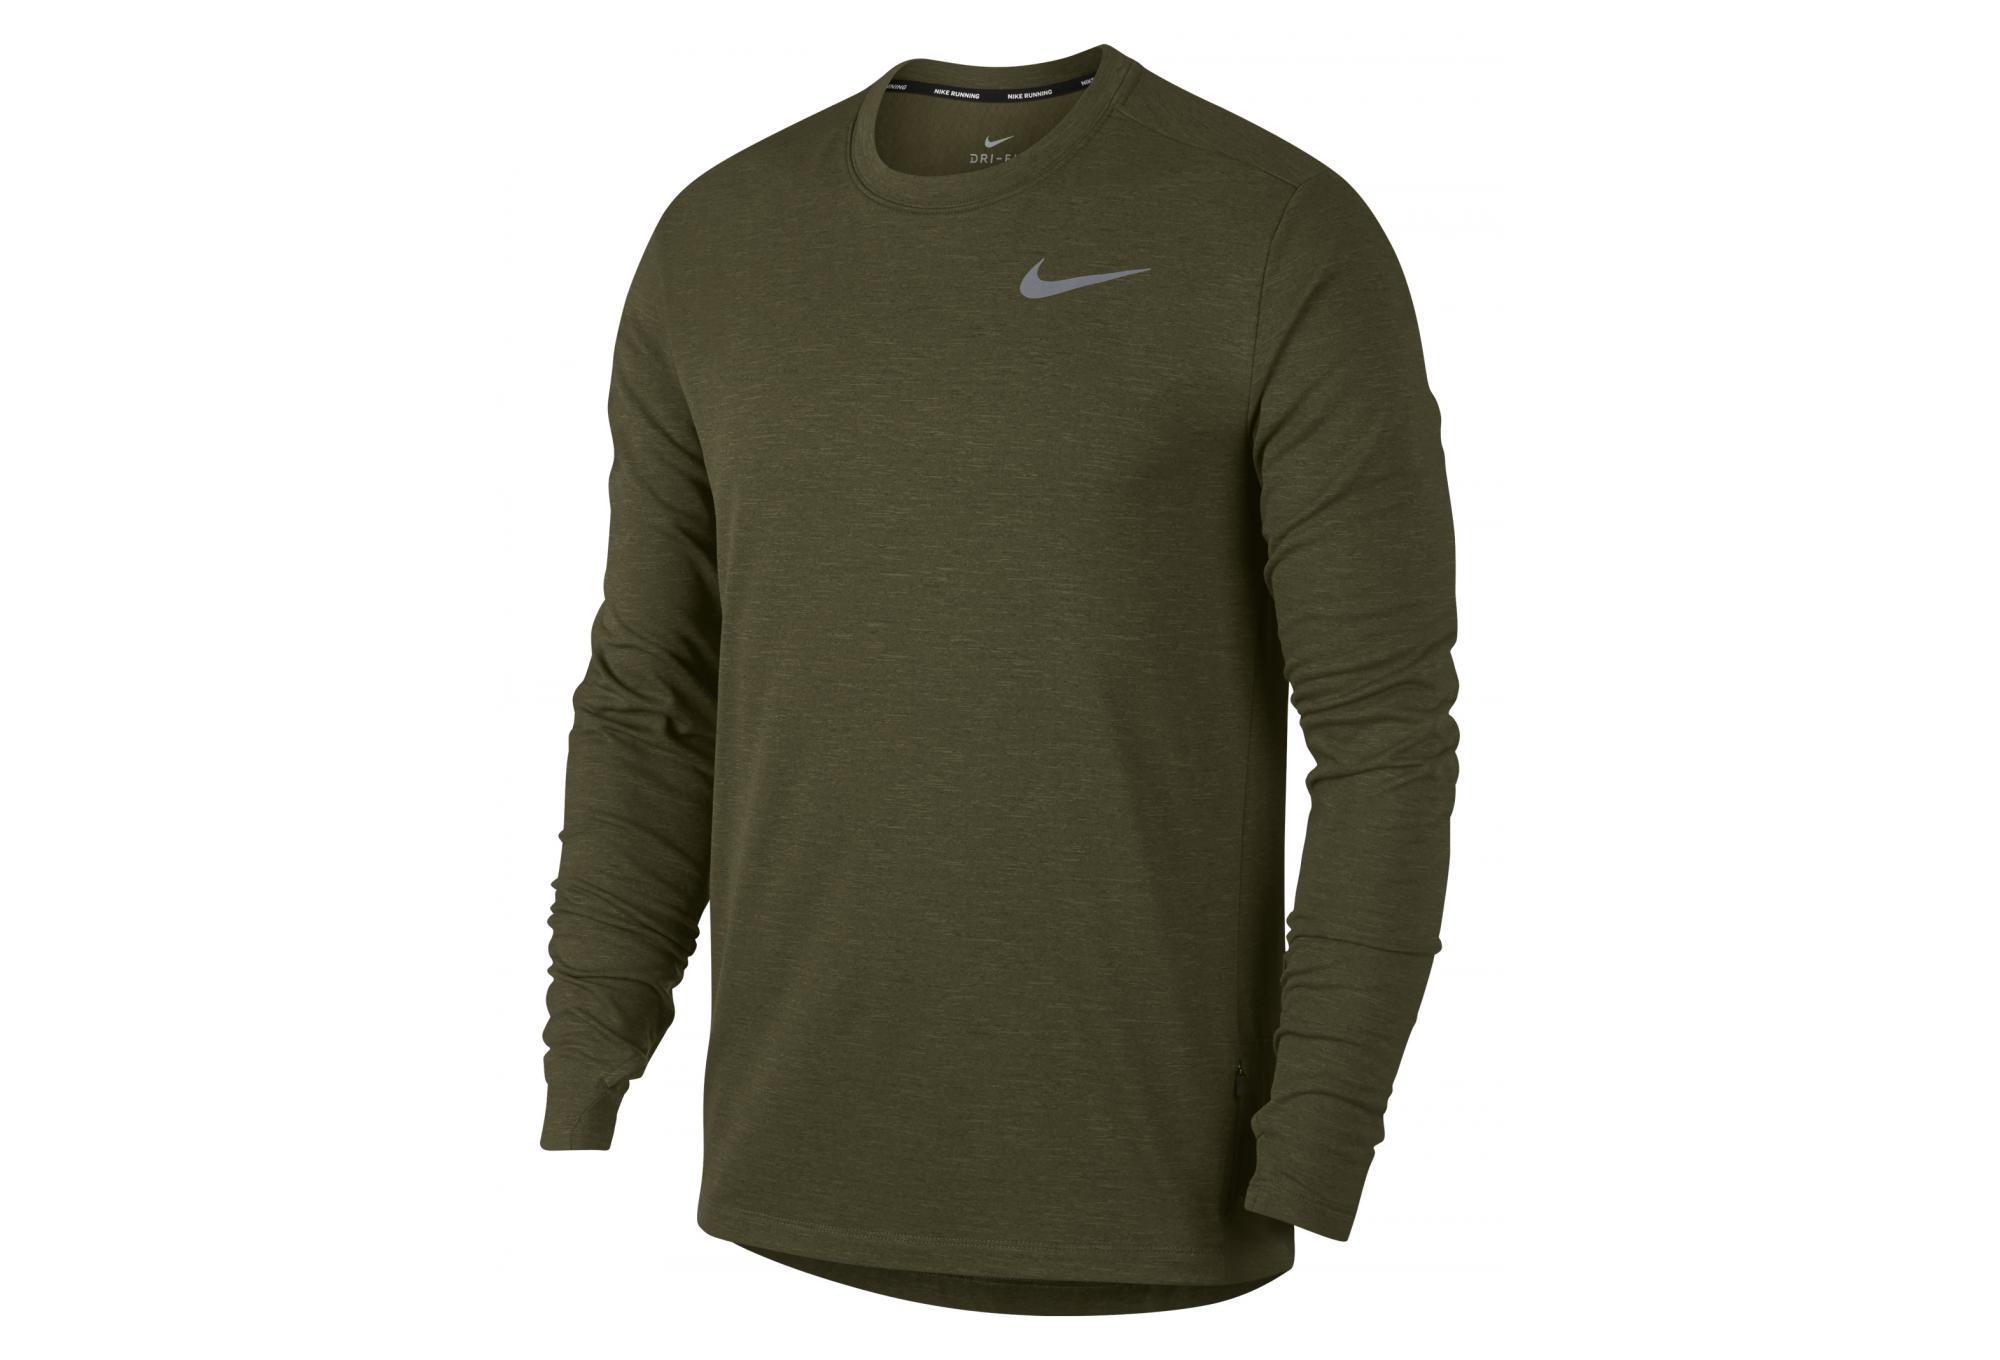 Maillot Manches Longues Nike Therma Sphere Element Vert Kaki